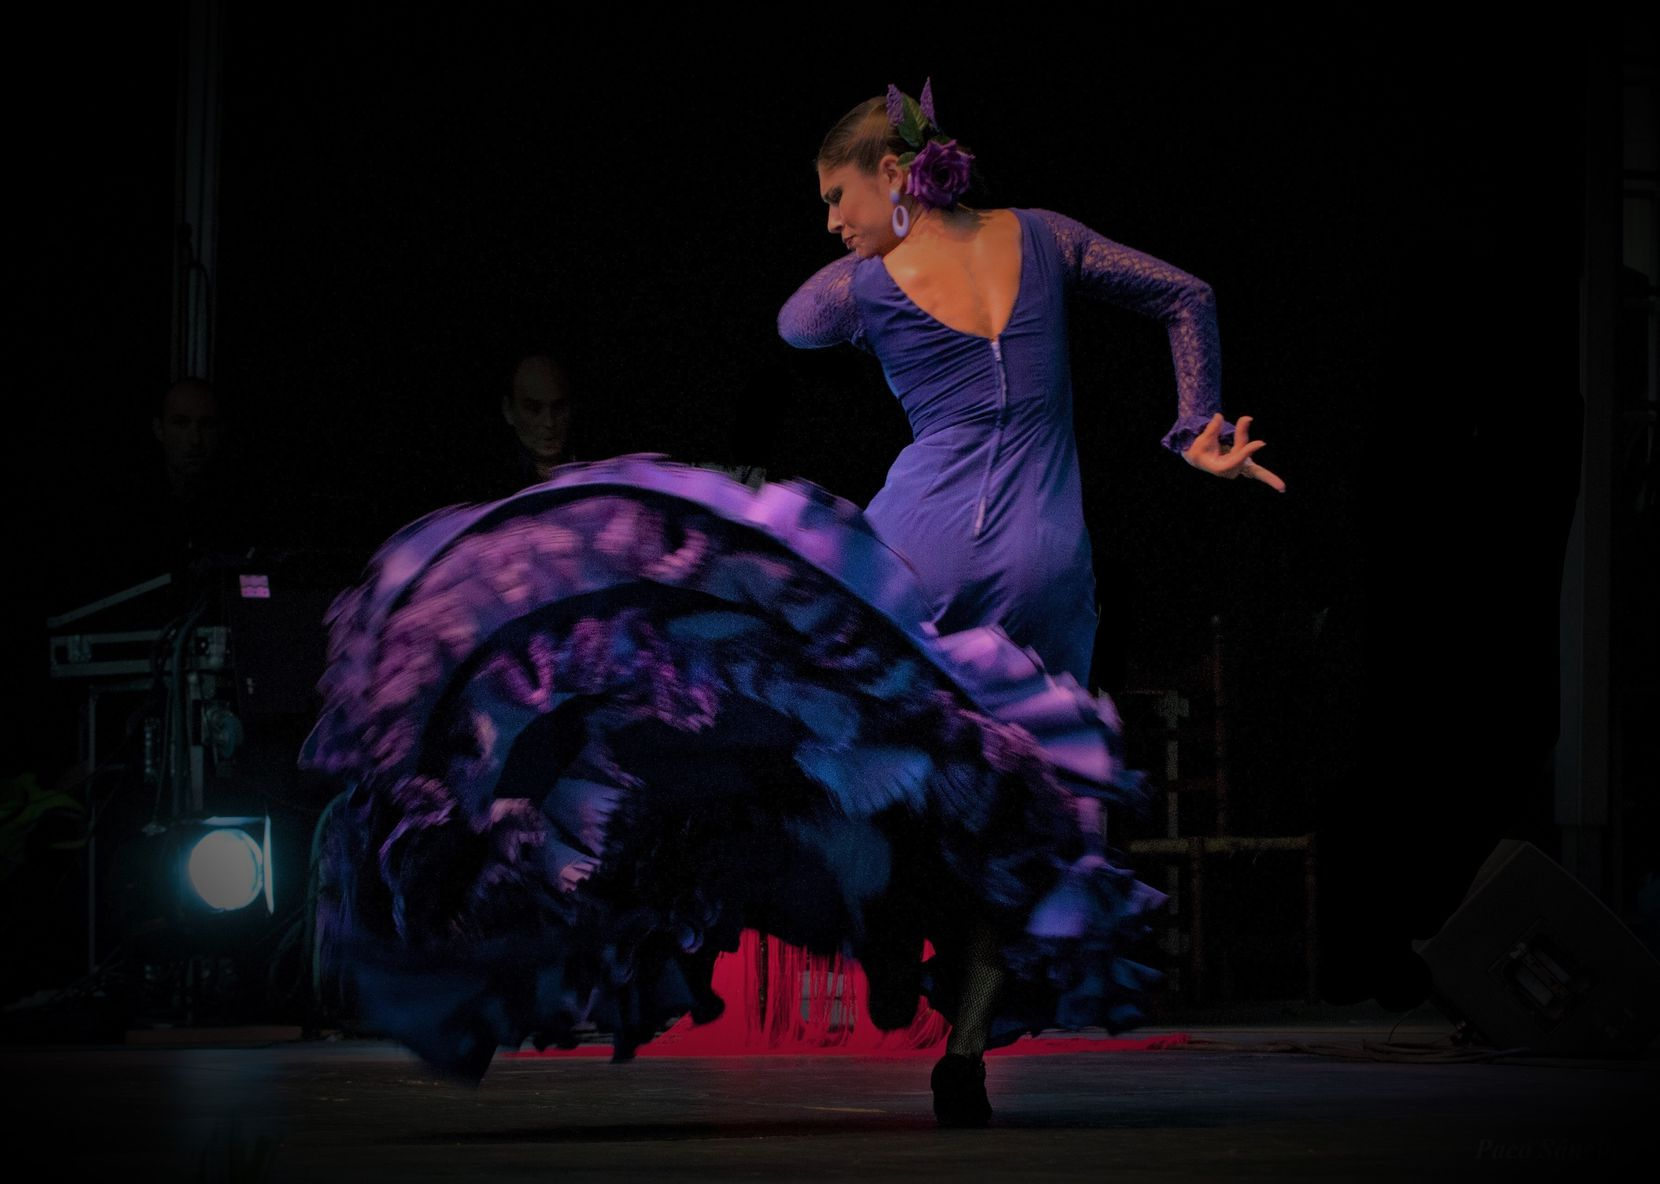 Flamenco dancer Lakshmi Basile dances at a previous Oak Cliff Flamenco Festival.